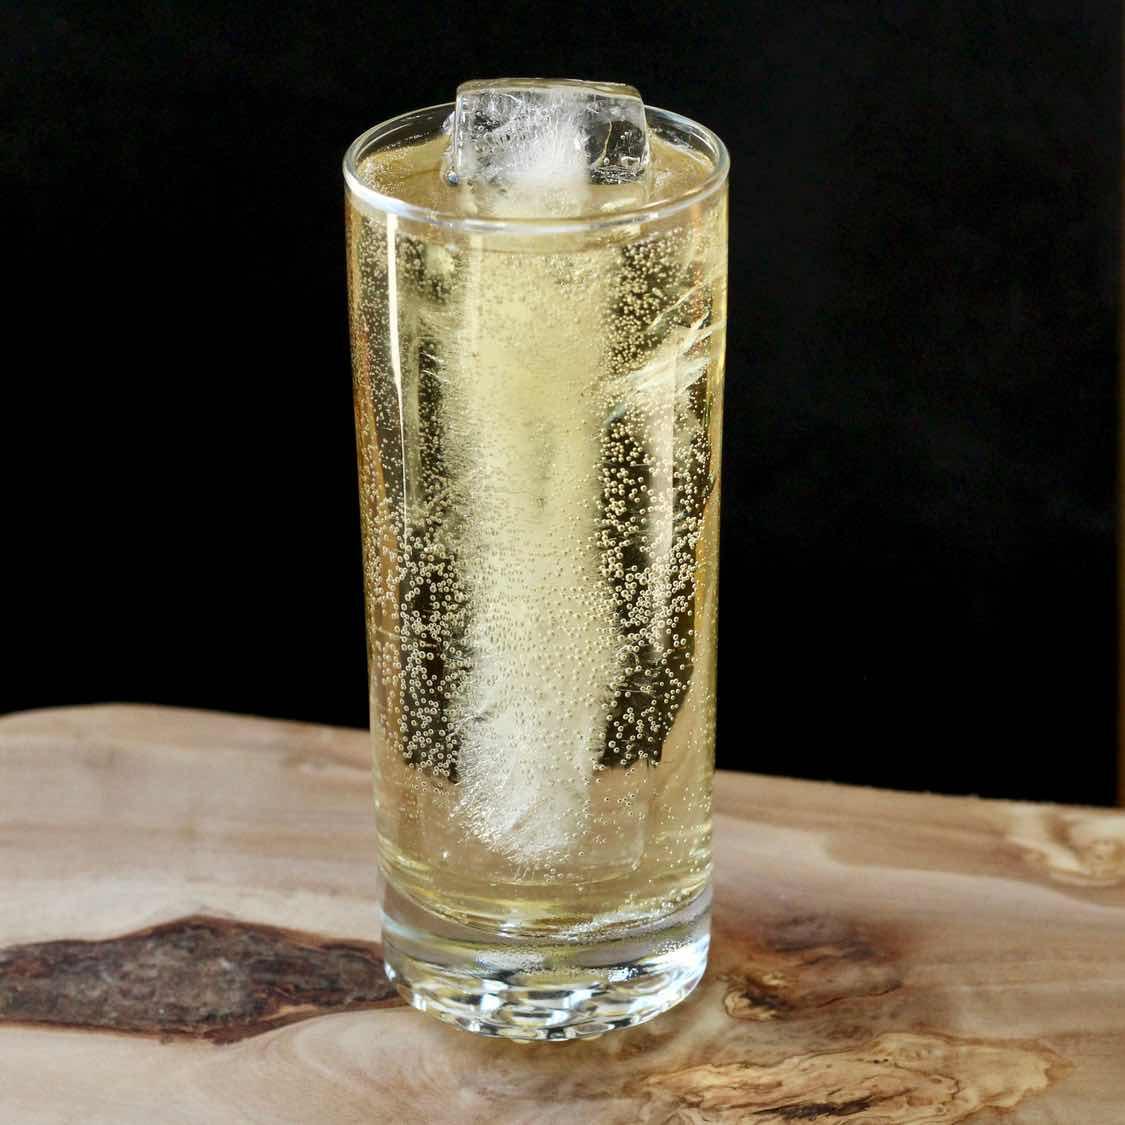 Mizuwari Cocktail - AKA The Japanese Highball